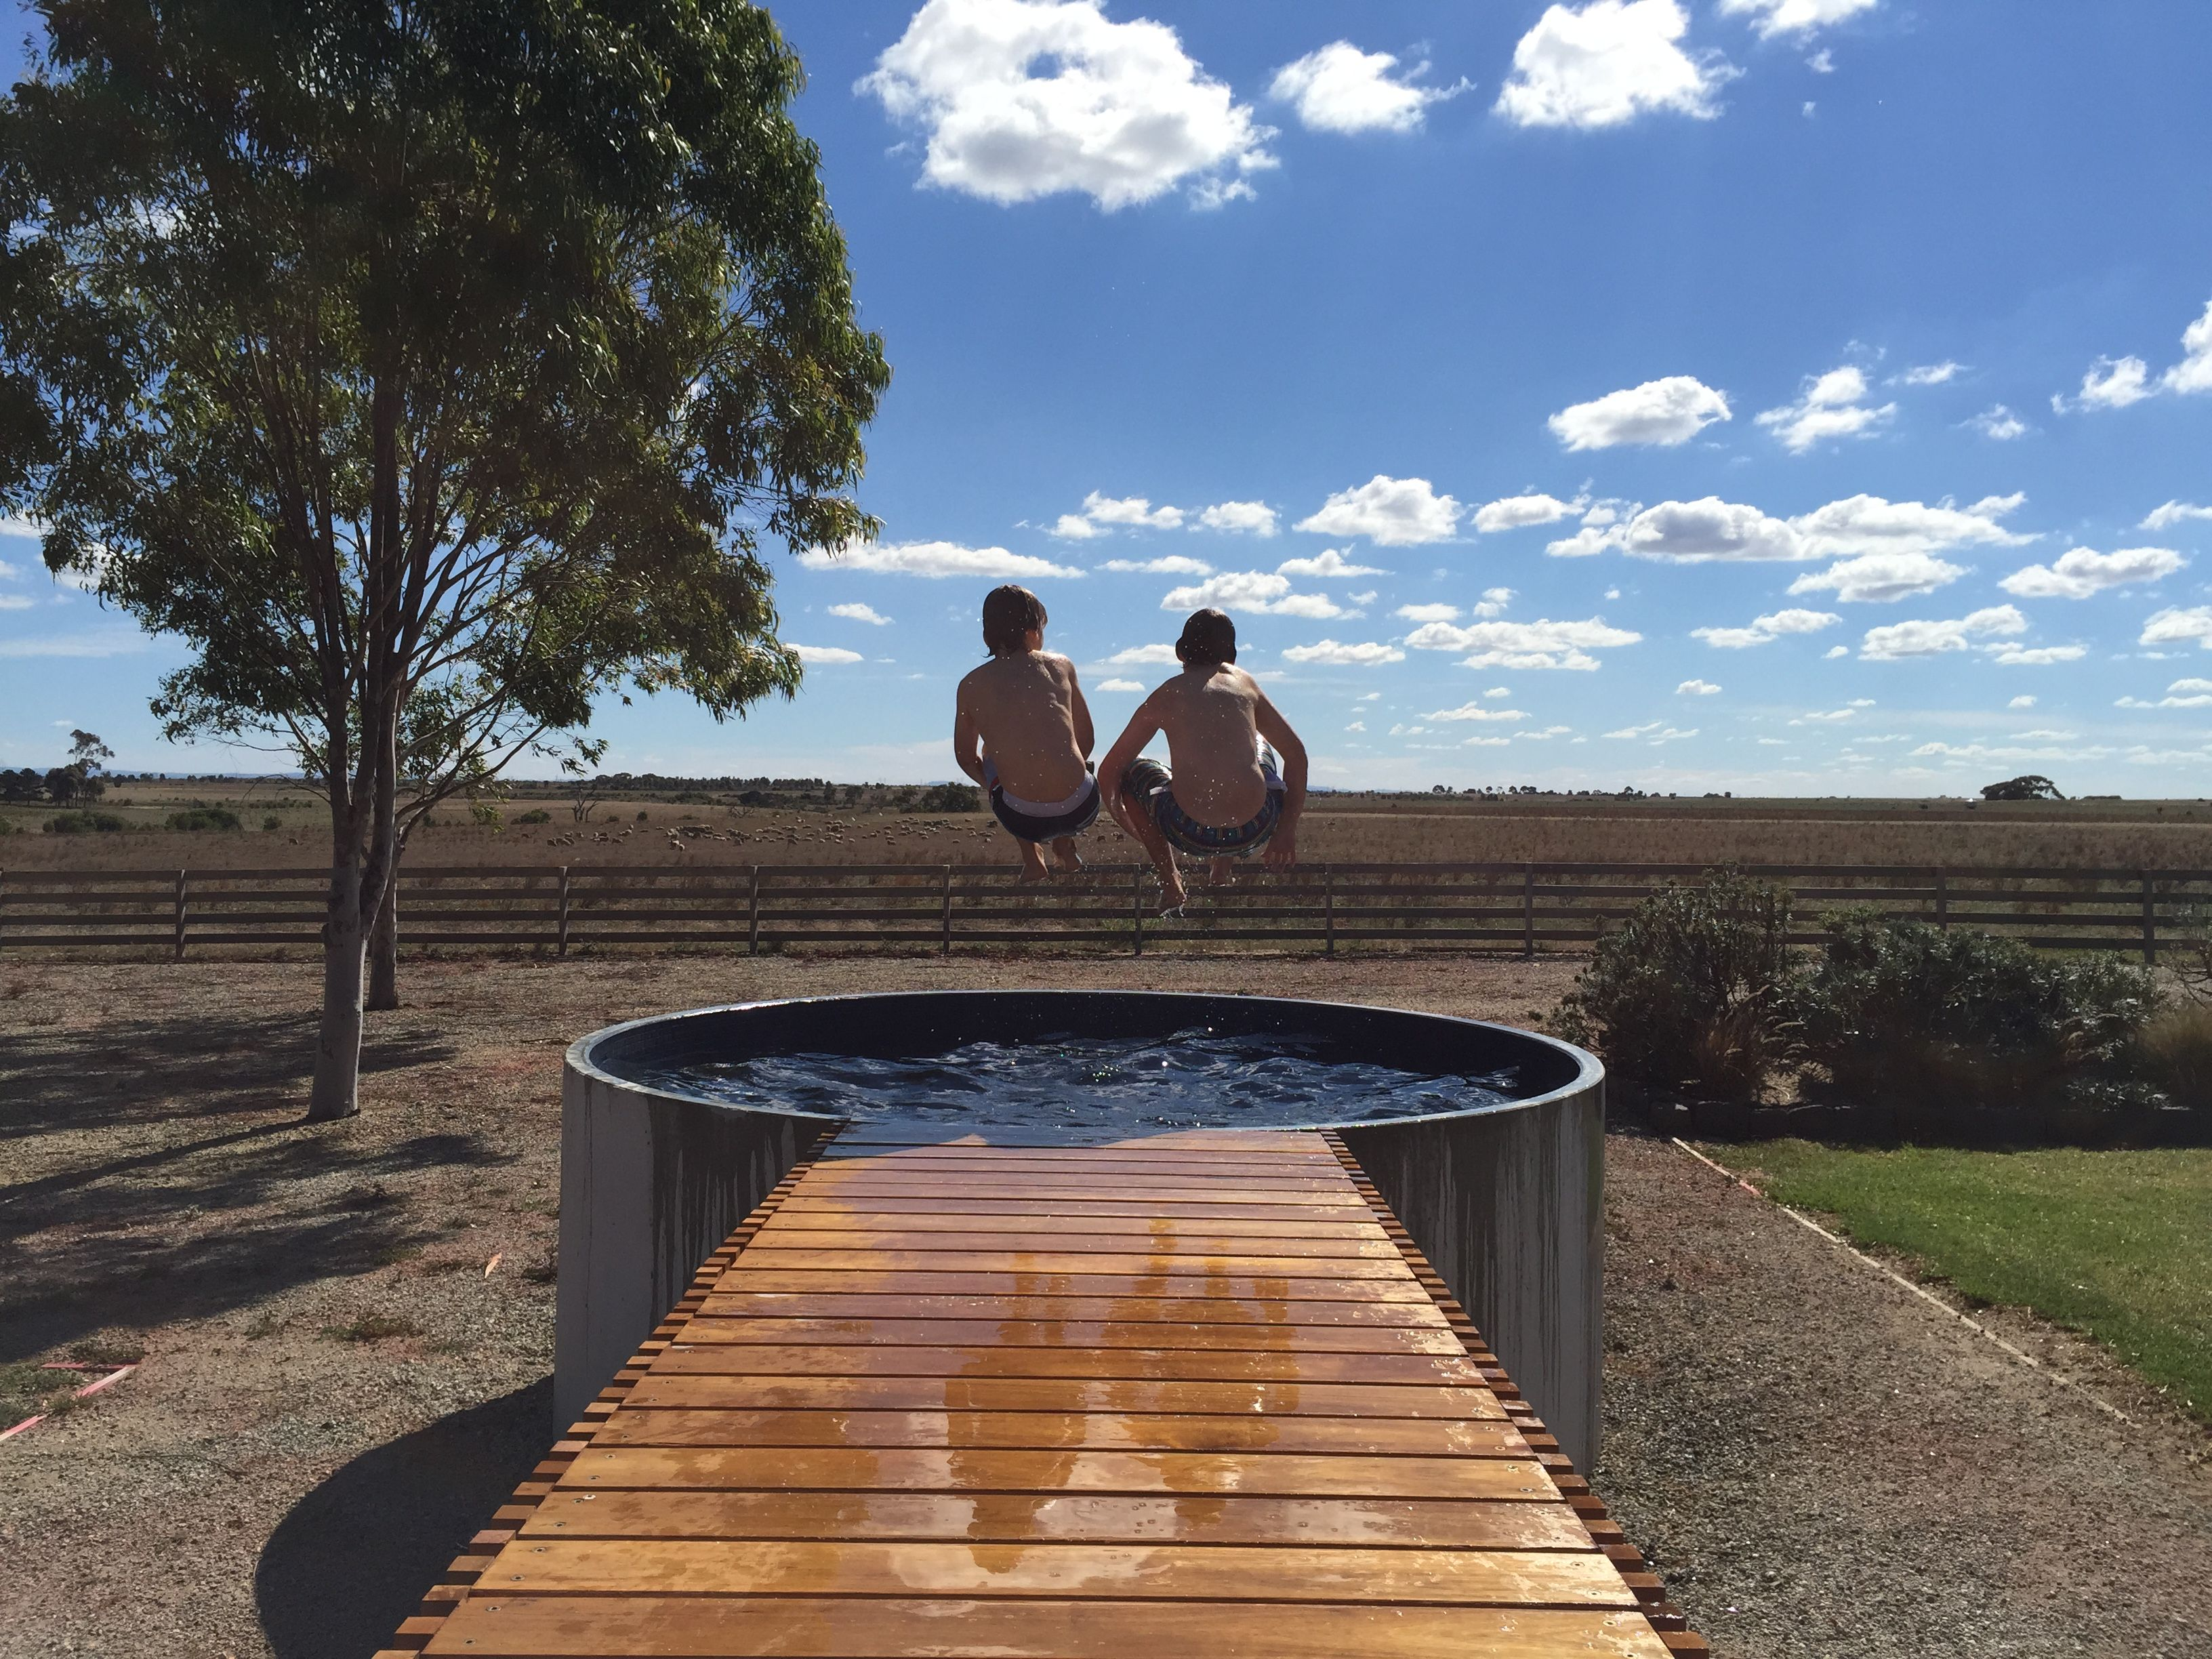 Australian plunge pool fun plunge pools inspiration for Garden plunge pool